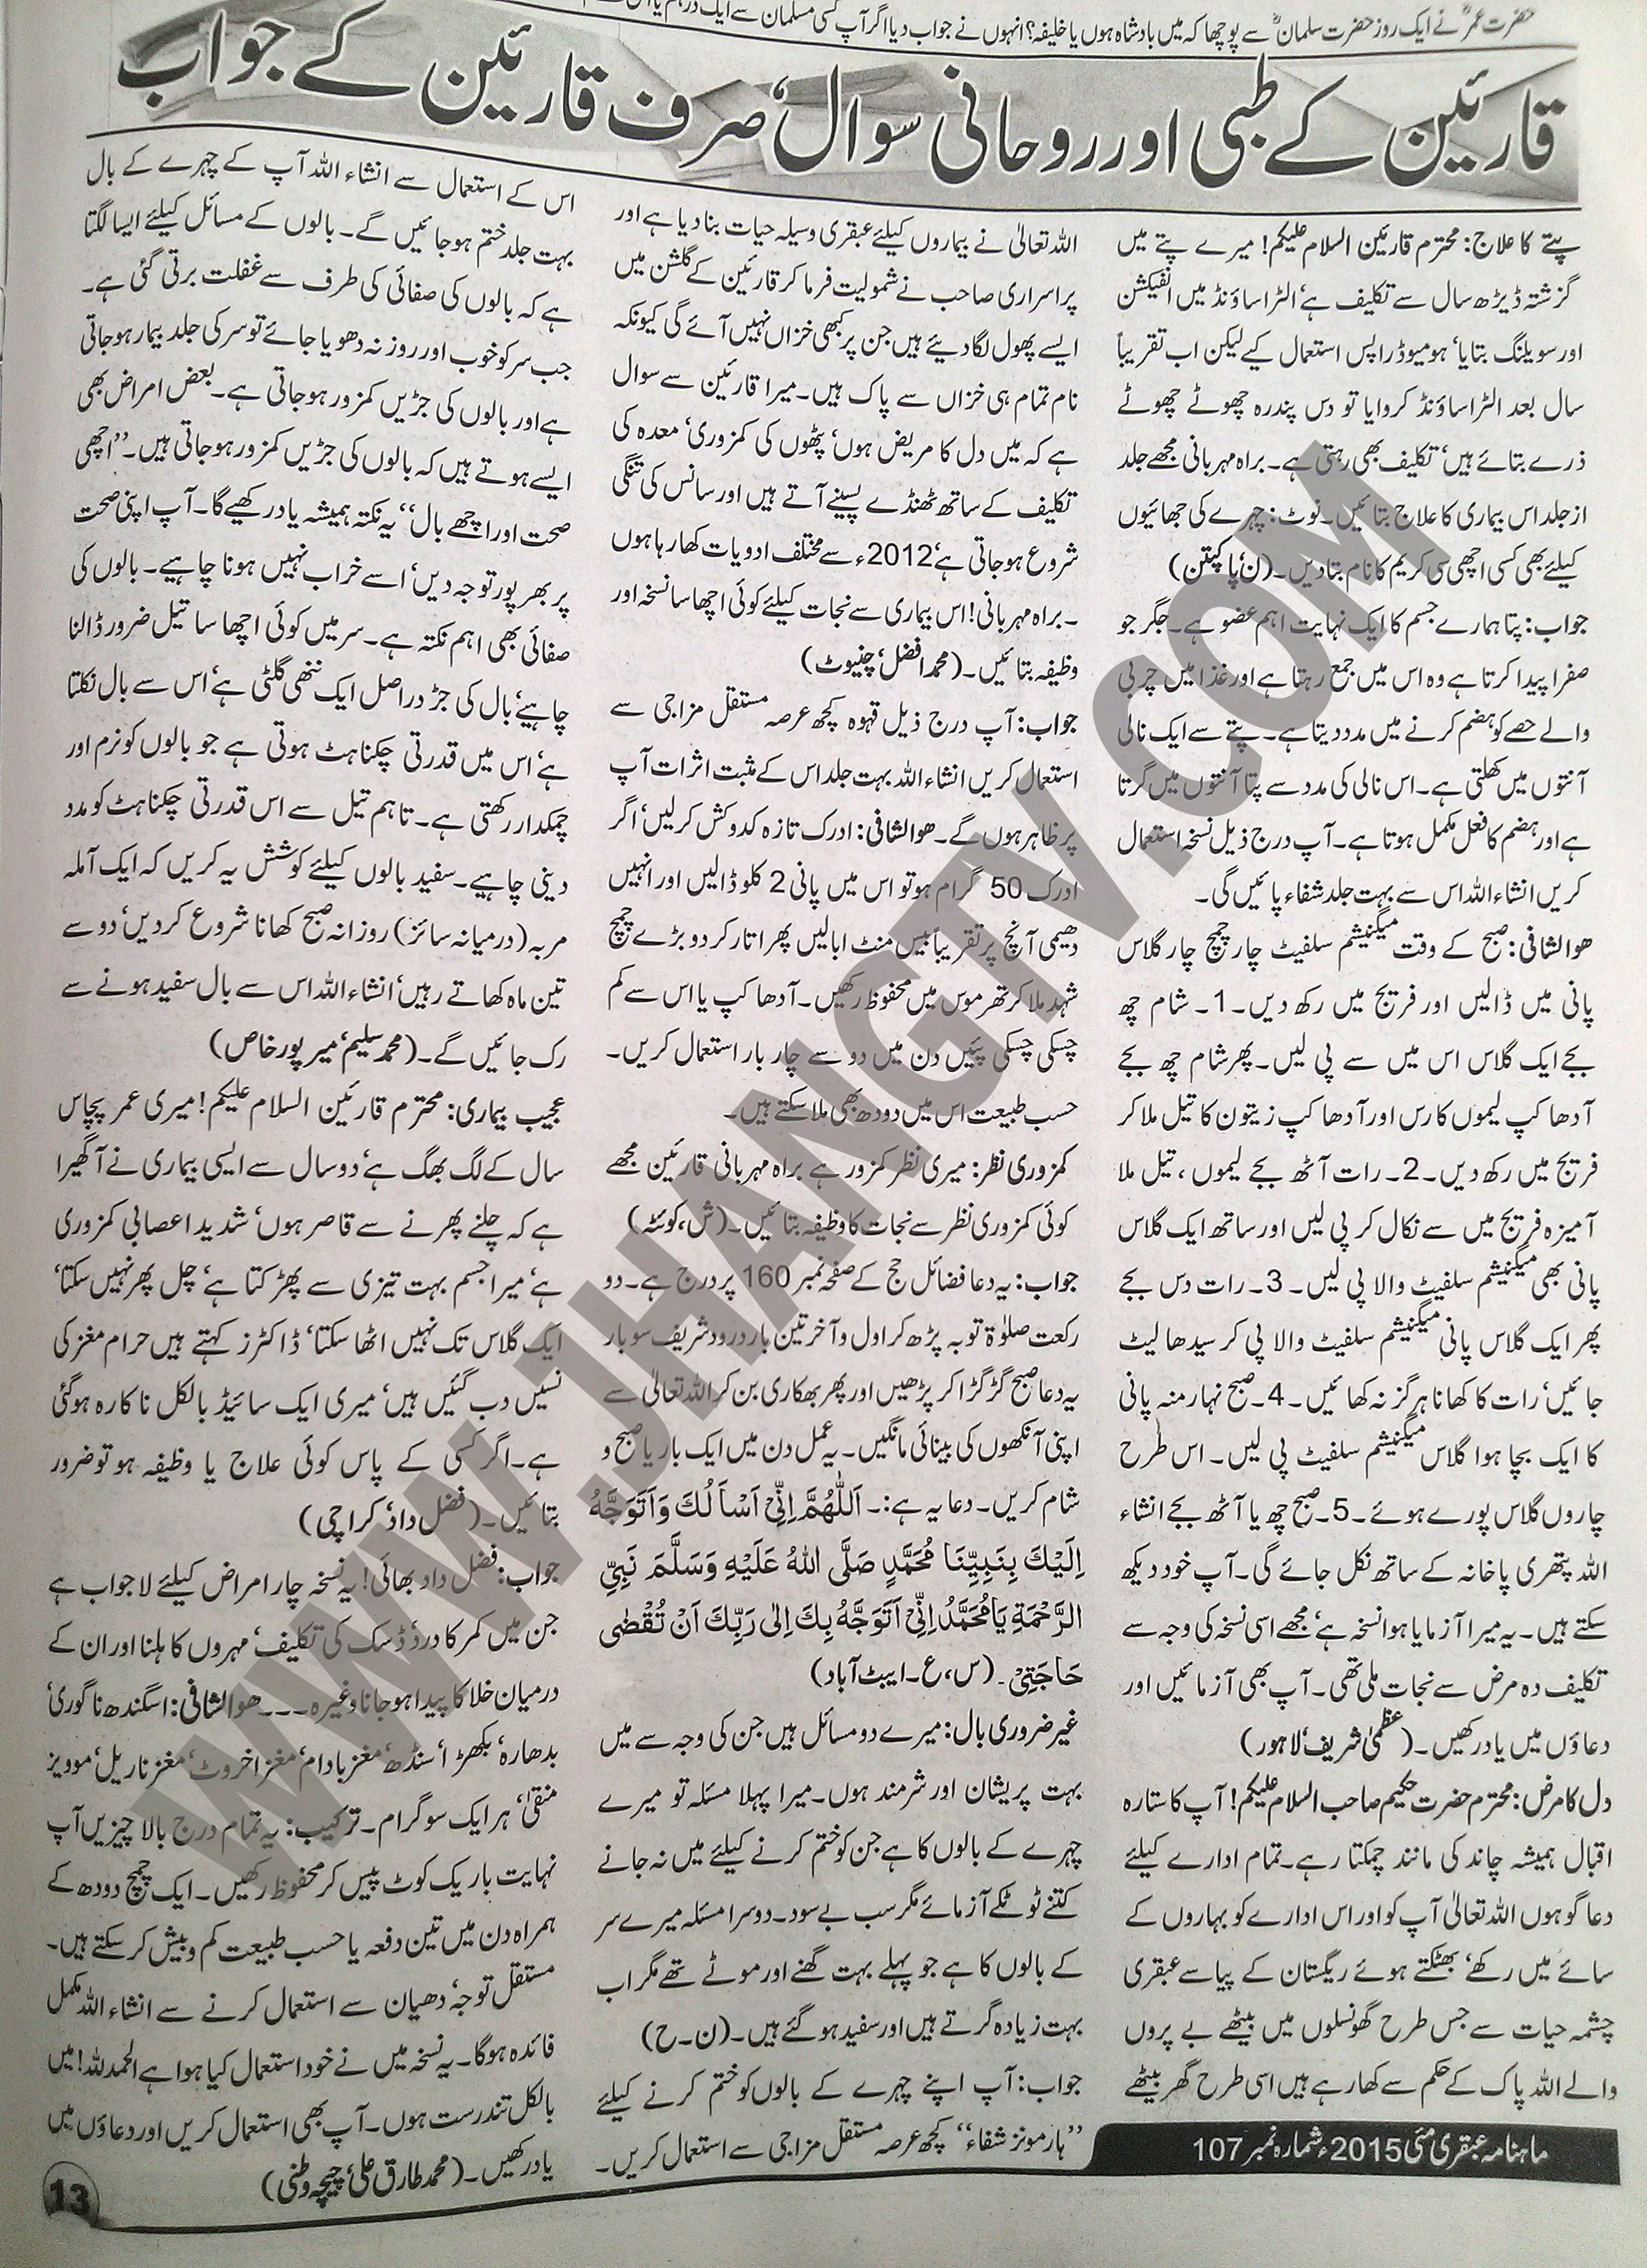 Ubqari May 2015 (11)